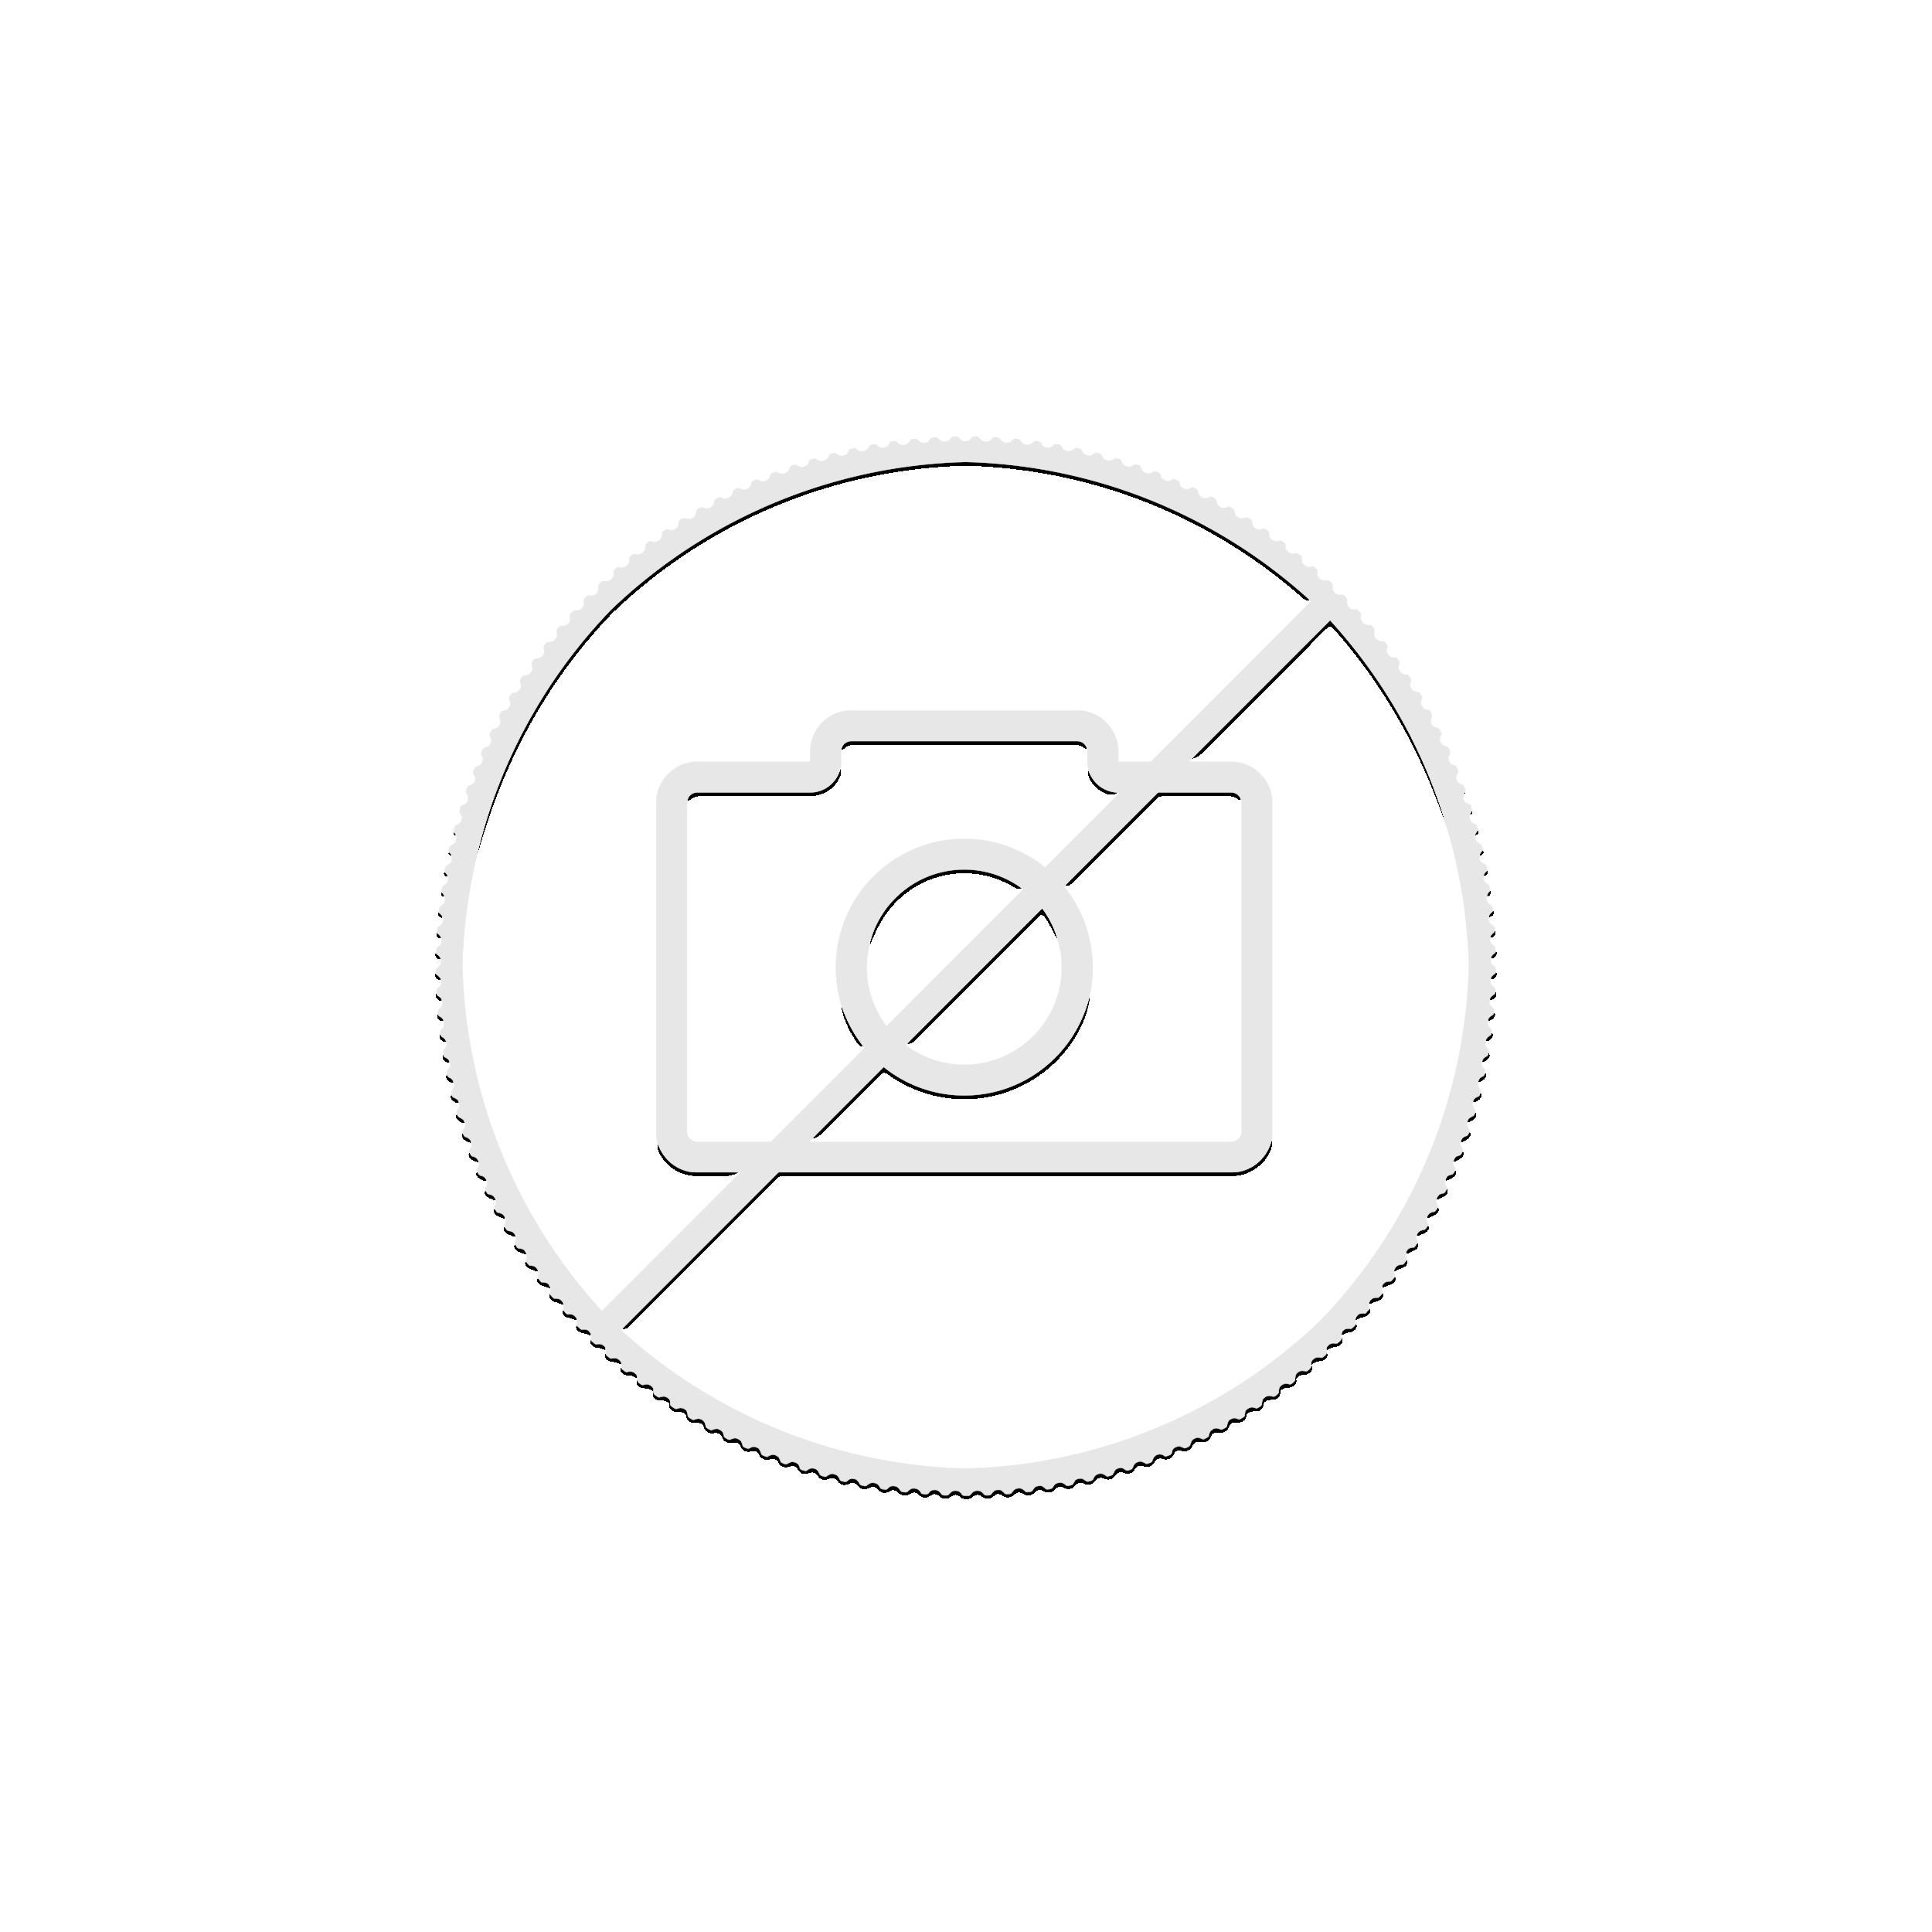 1 troy ounce zilveren munt Woodland Spirit 2021 Proof